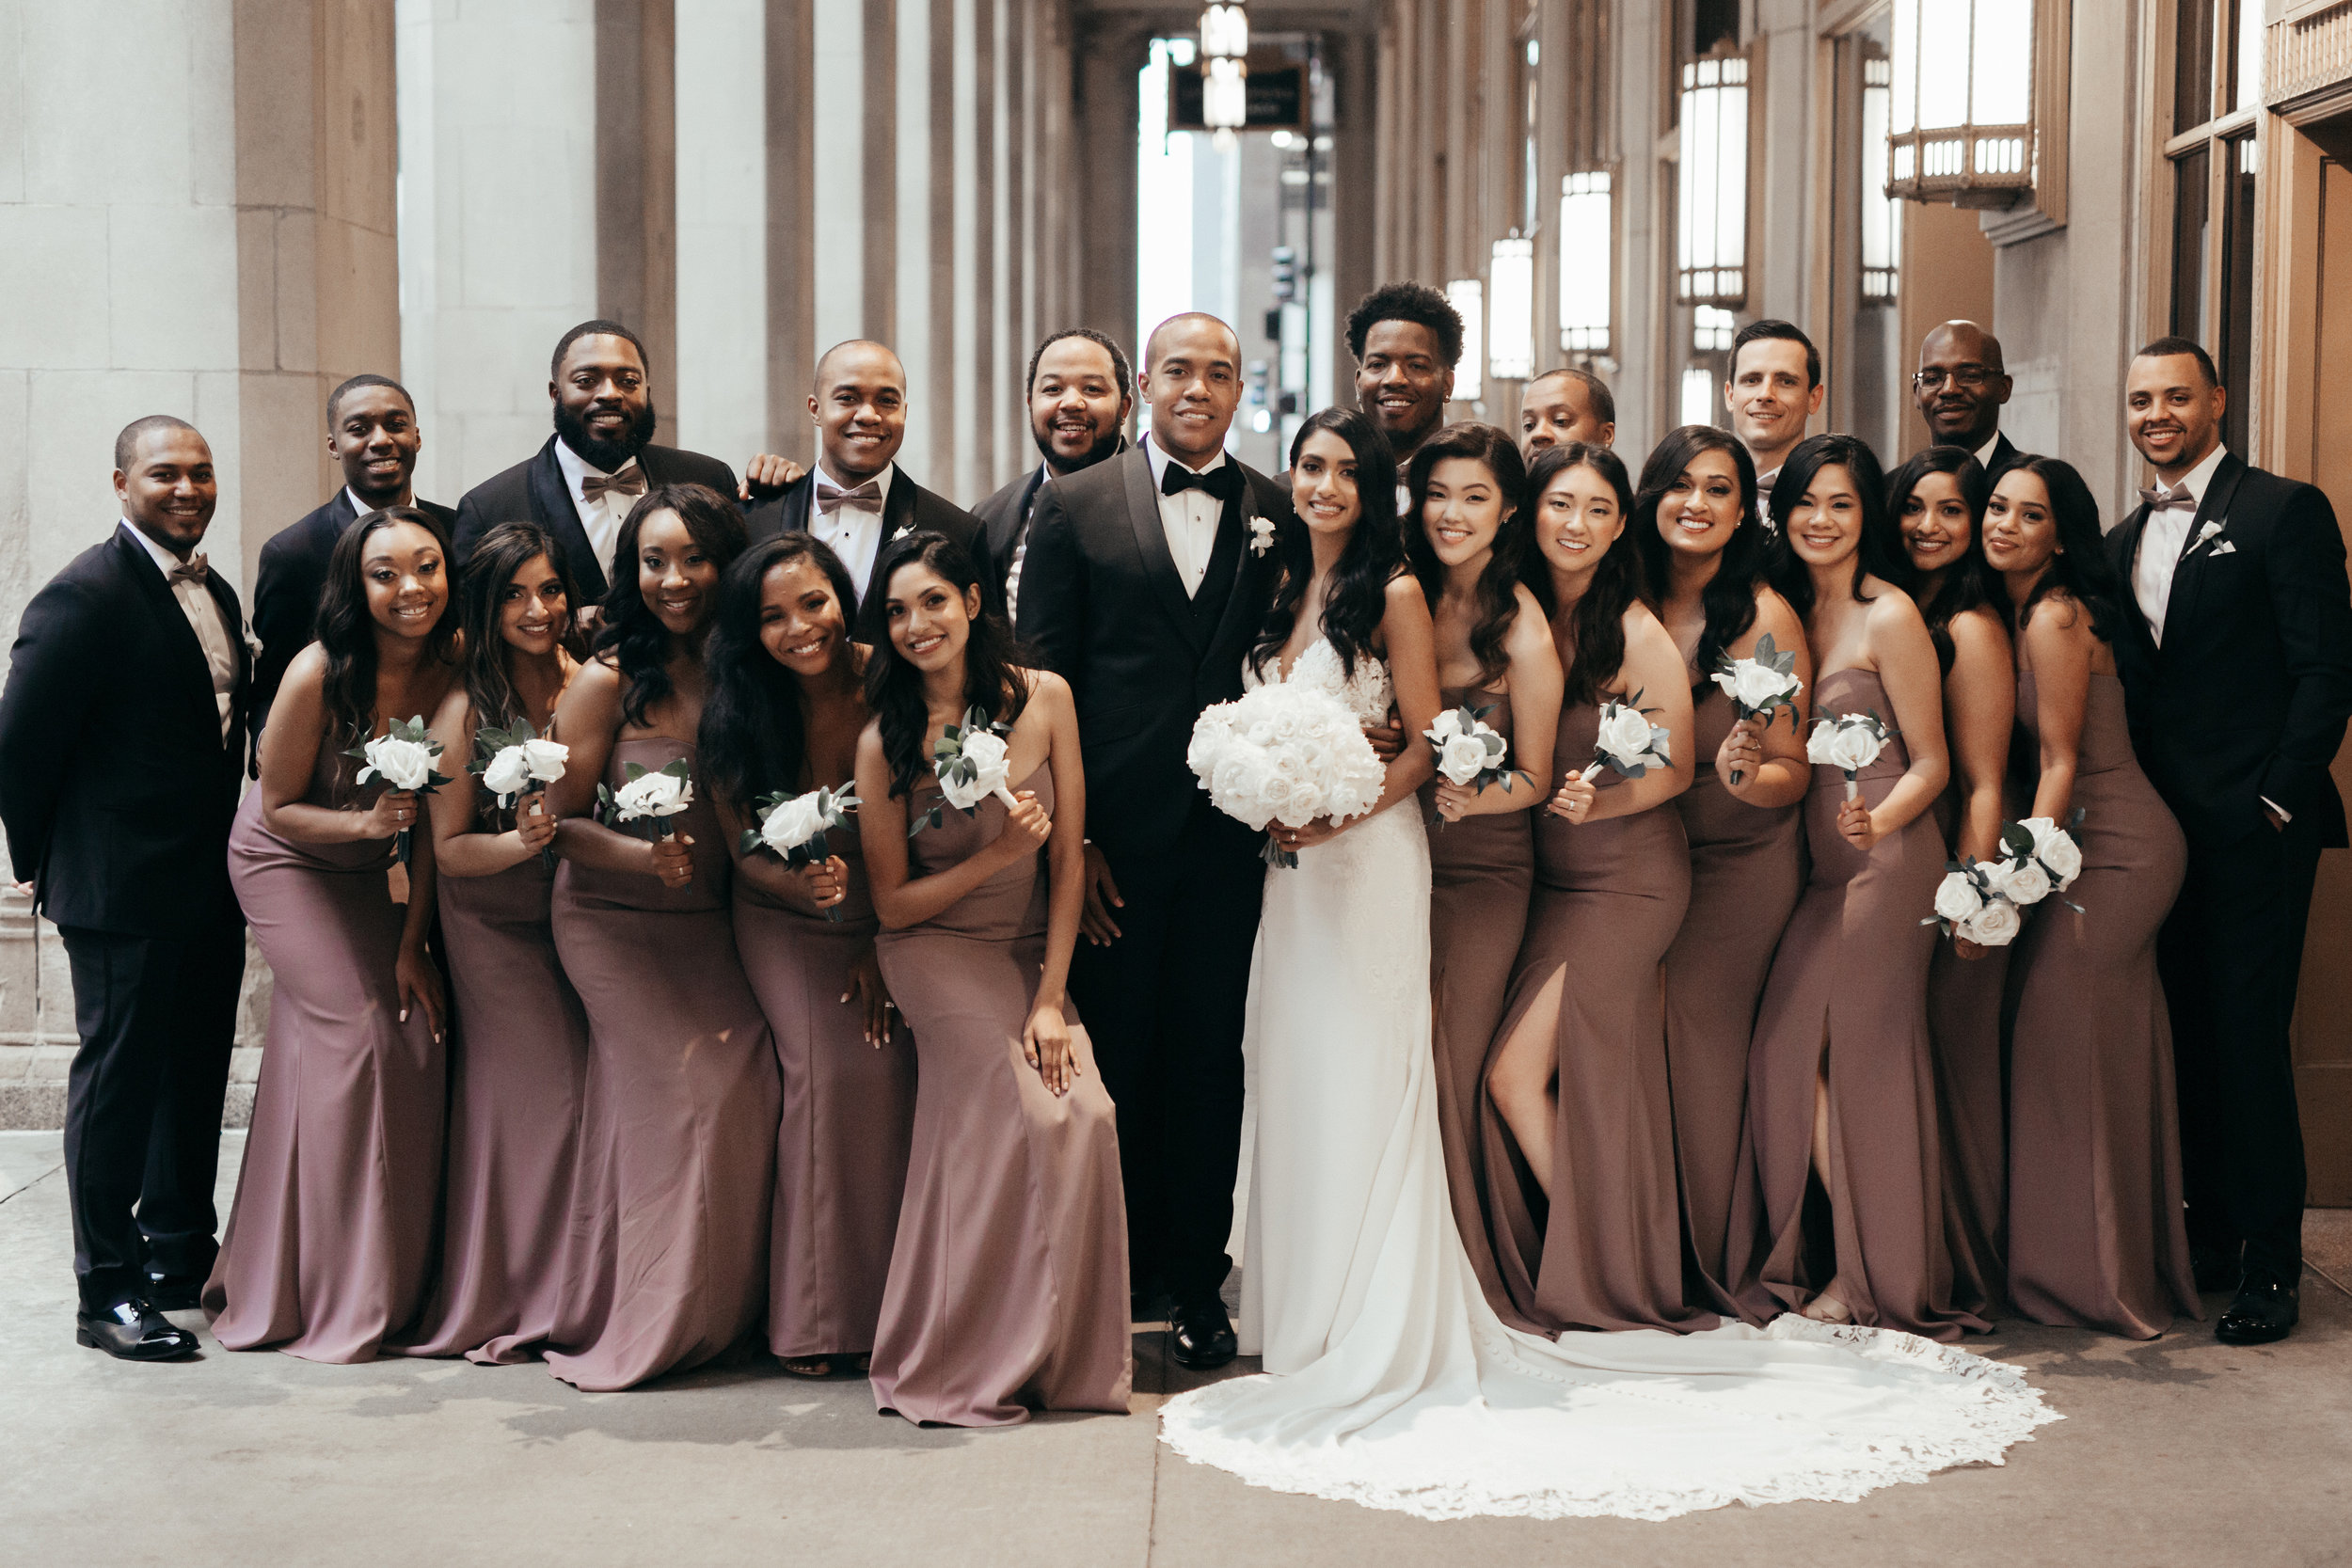 Mindy&Jared-wedding-by-LadiesAndGentlemen-by-Matija-Vuri-4252.jpg